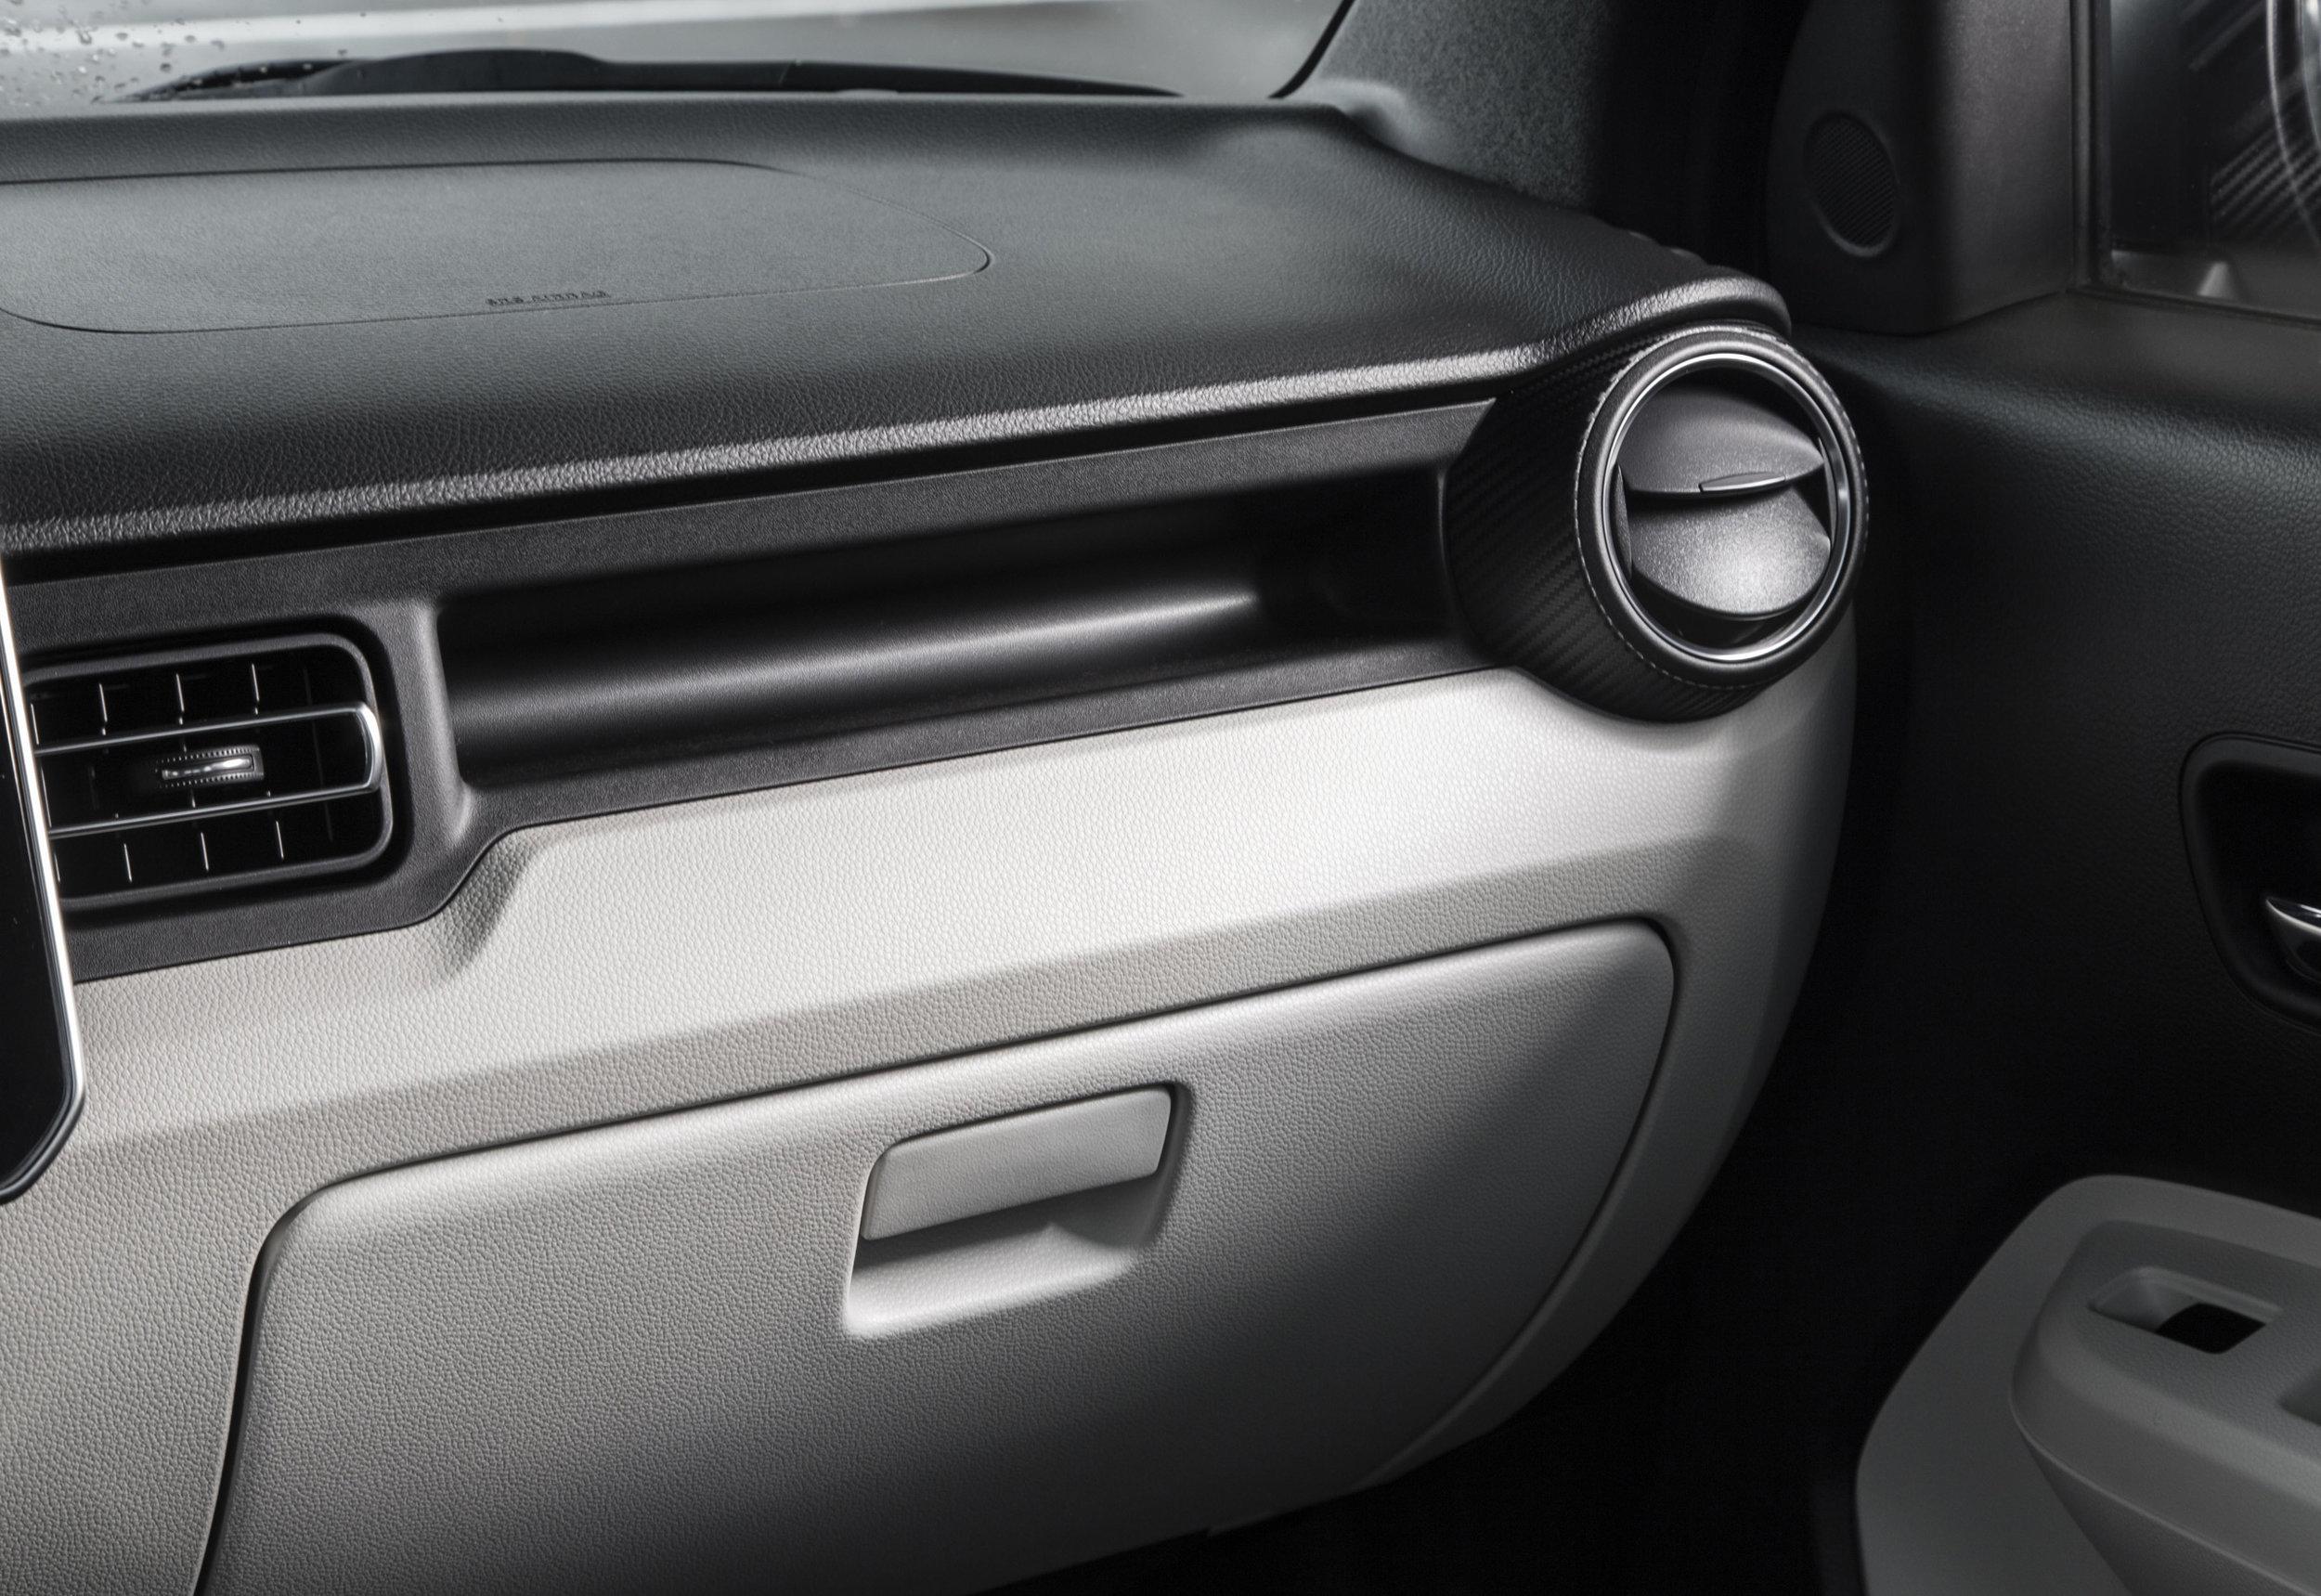 Interior---Dash_Glove-Box.jpg